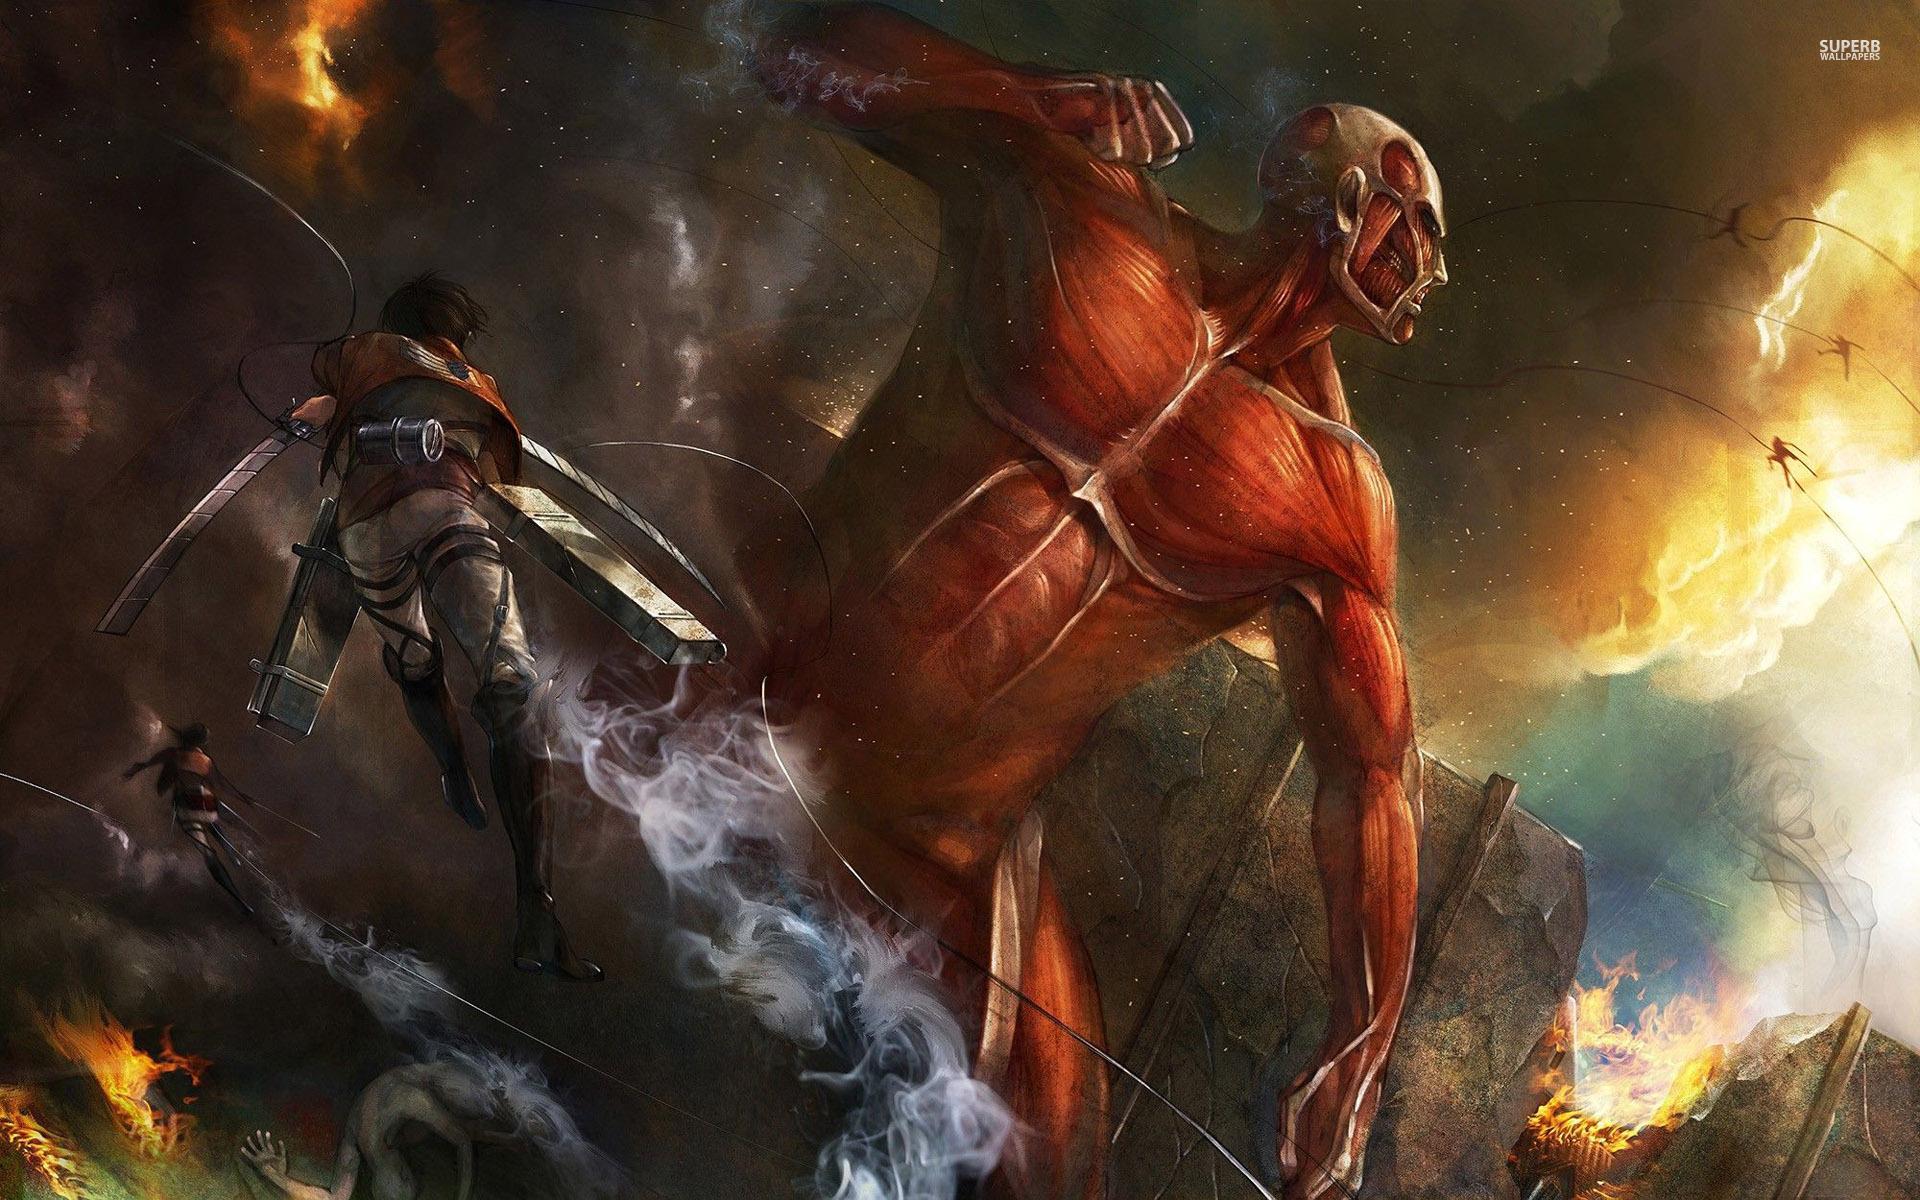 49 Attack On Titan Hd Wallpaper On Wallpapersafari